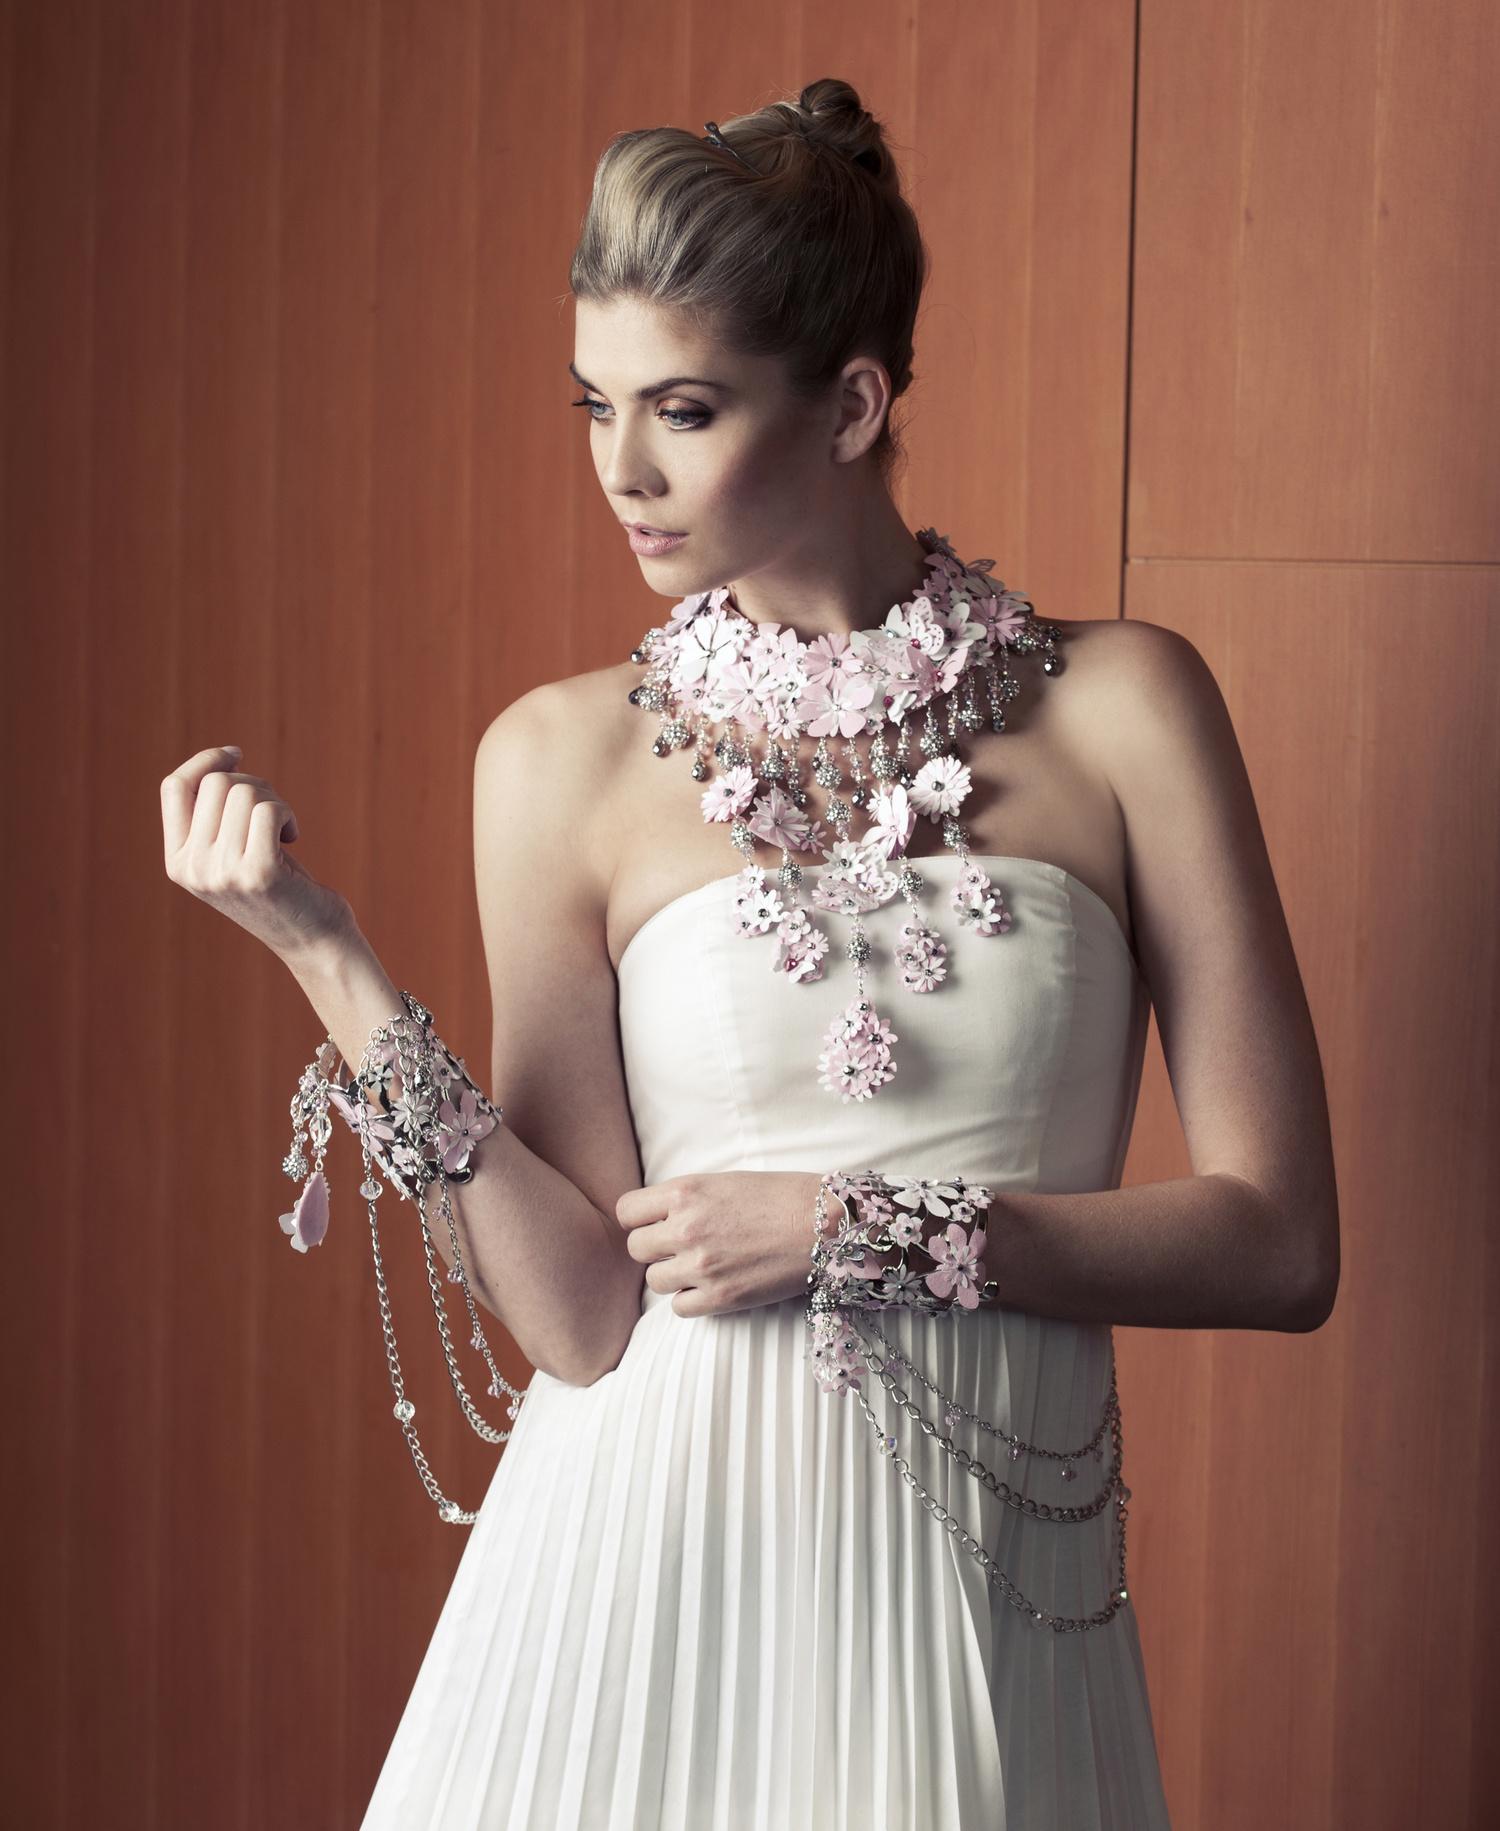 White-Cashmere-Collection-2013-Rita-Tesolin-Photographer-Caitlin-Cronenberg.jpg